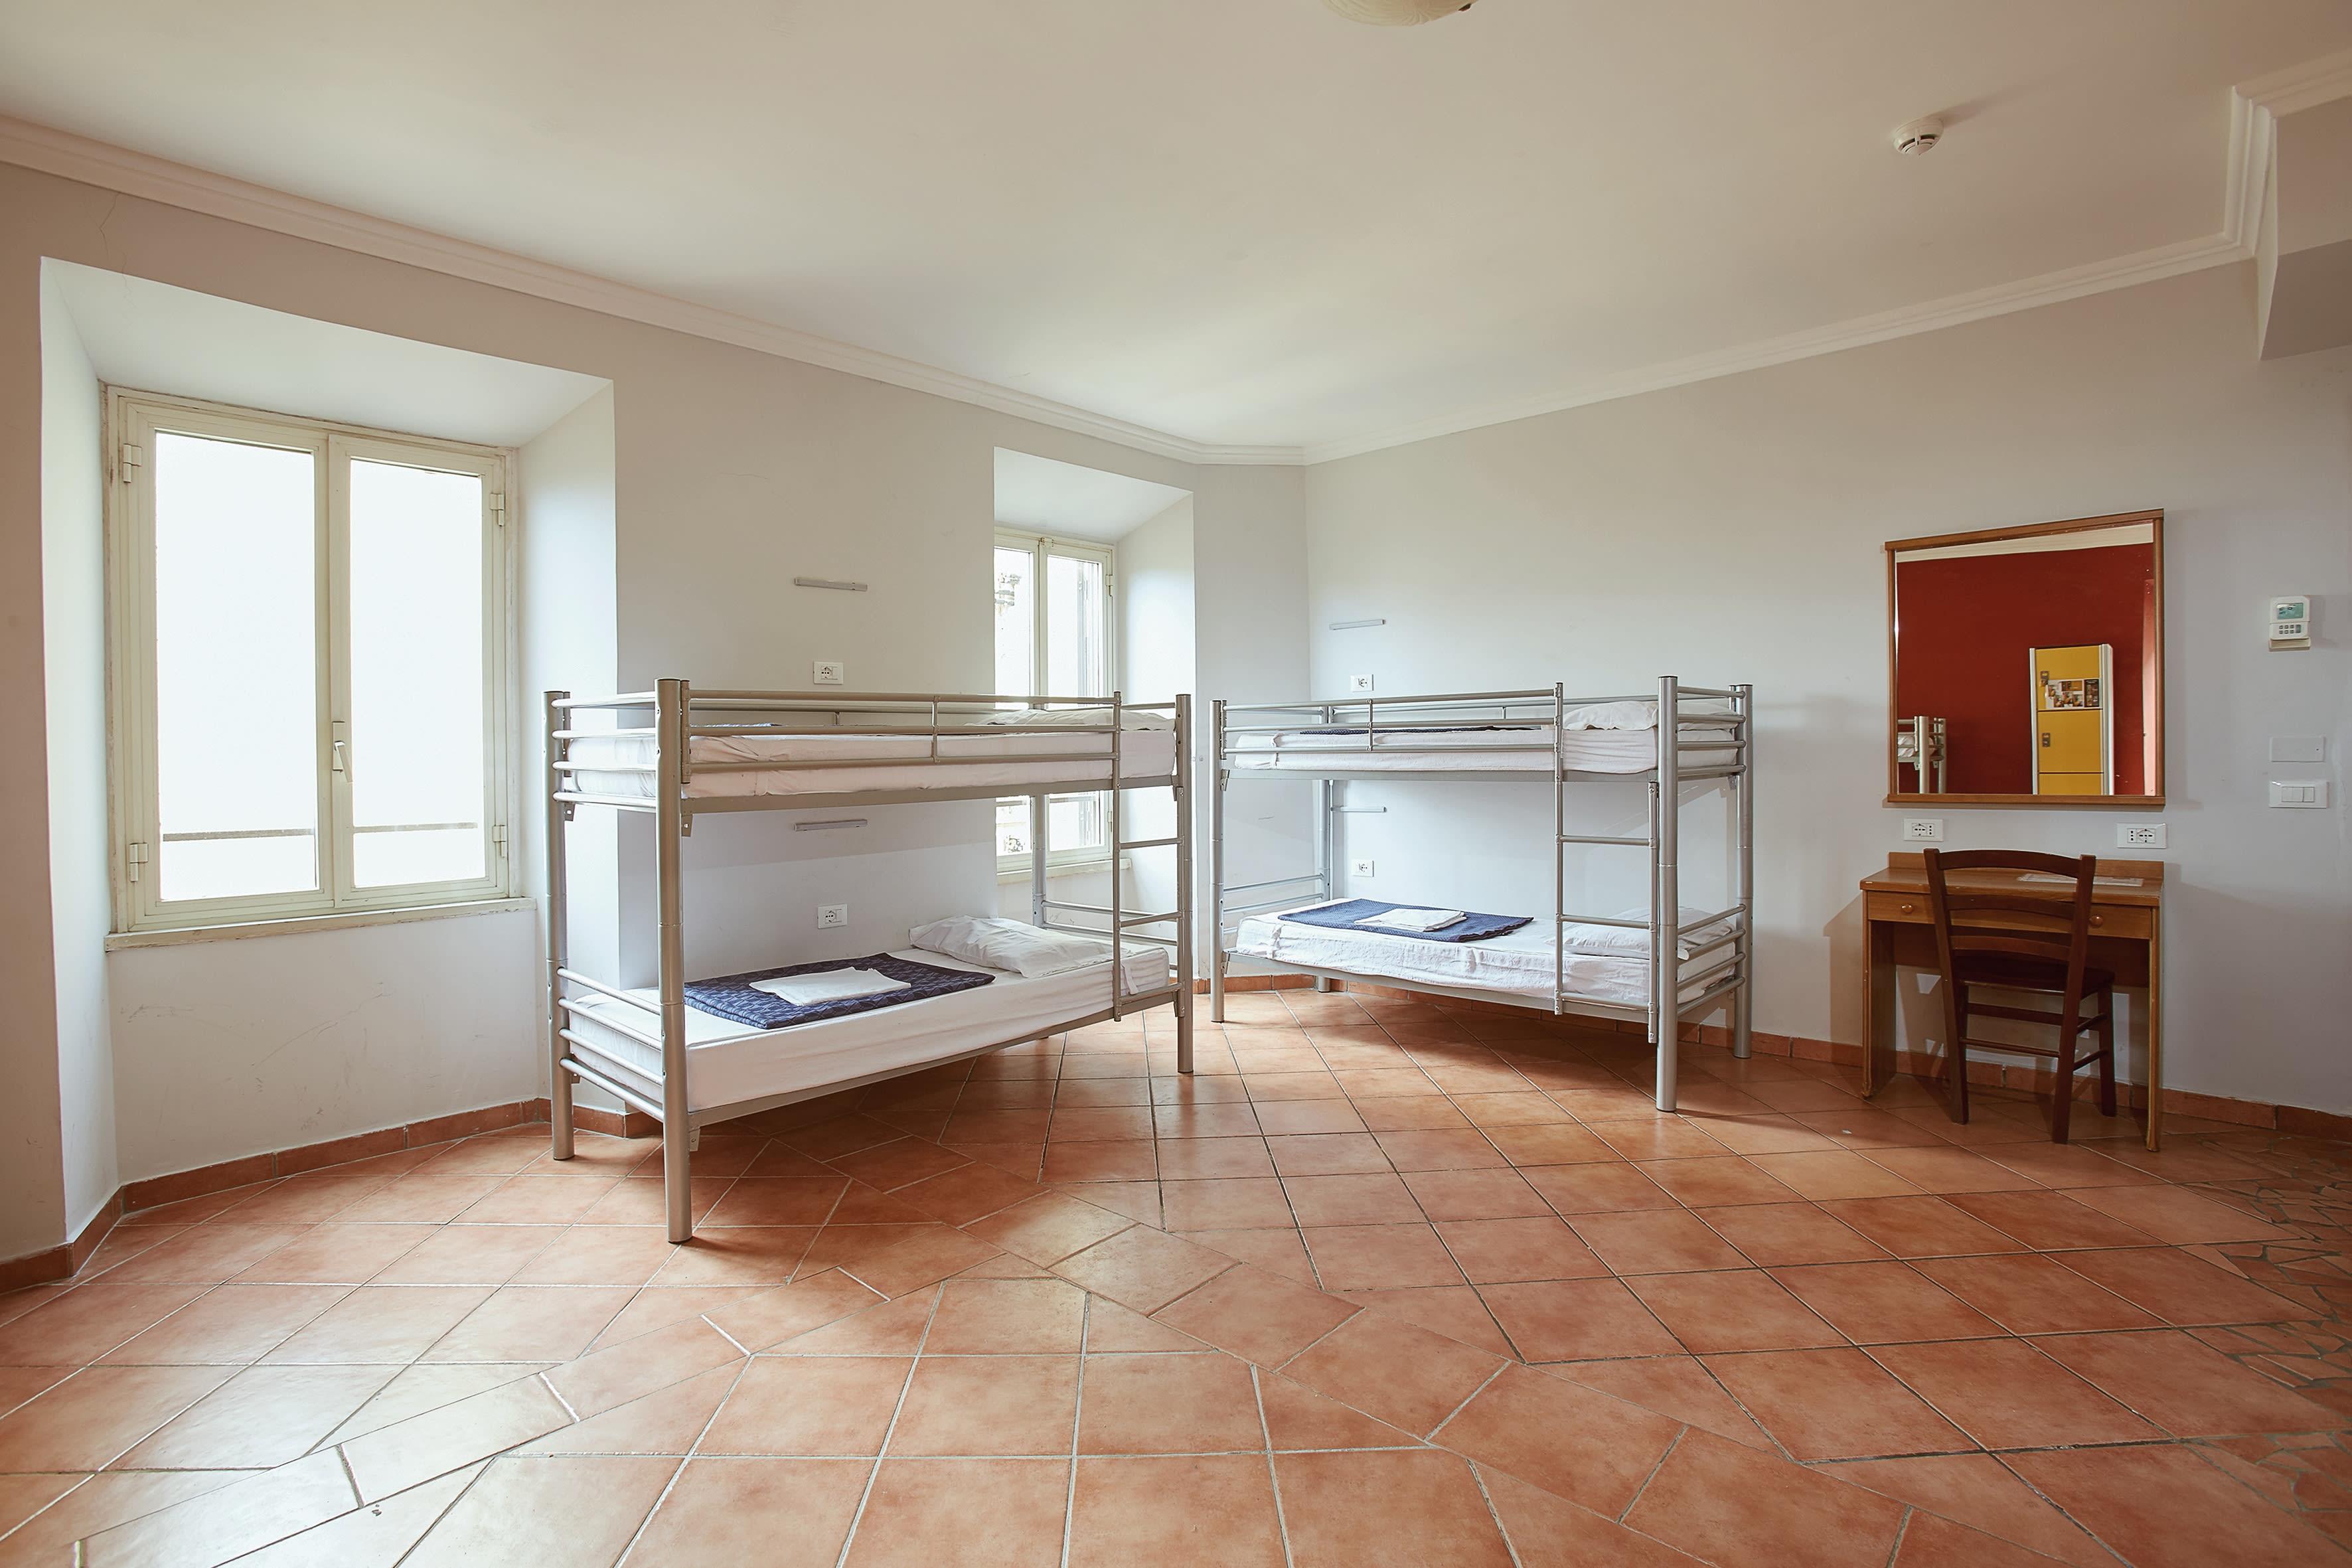 HOSTEL - Alessandro Palace Hostel & Bar